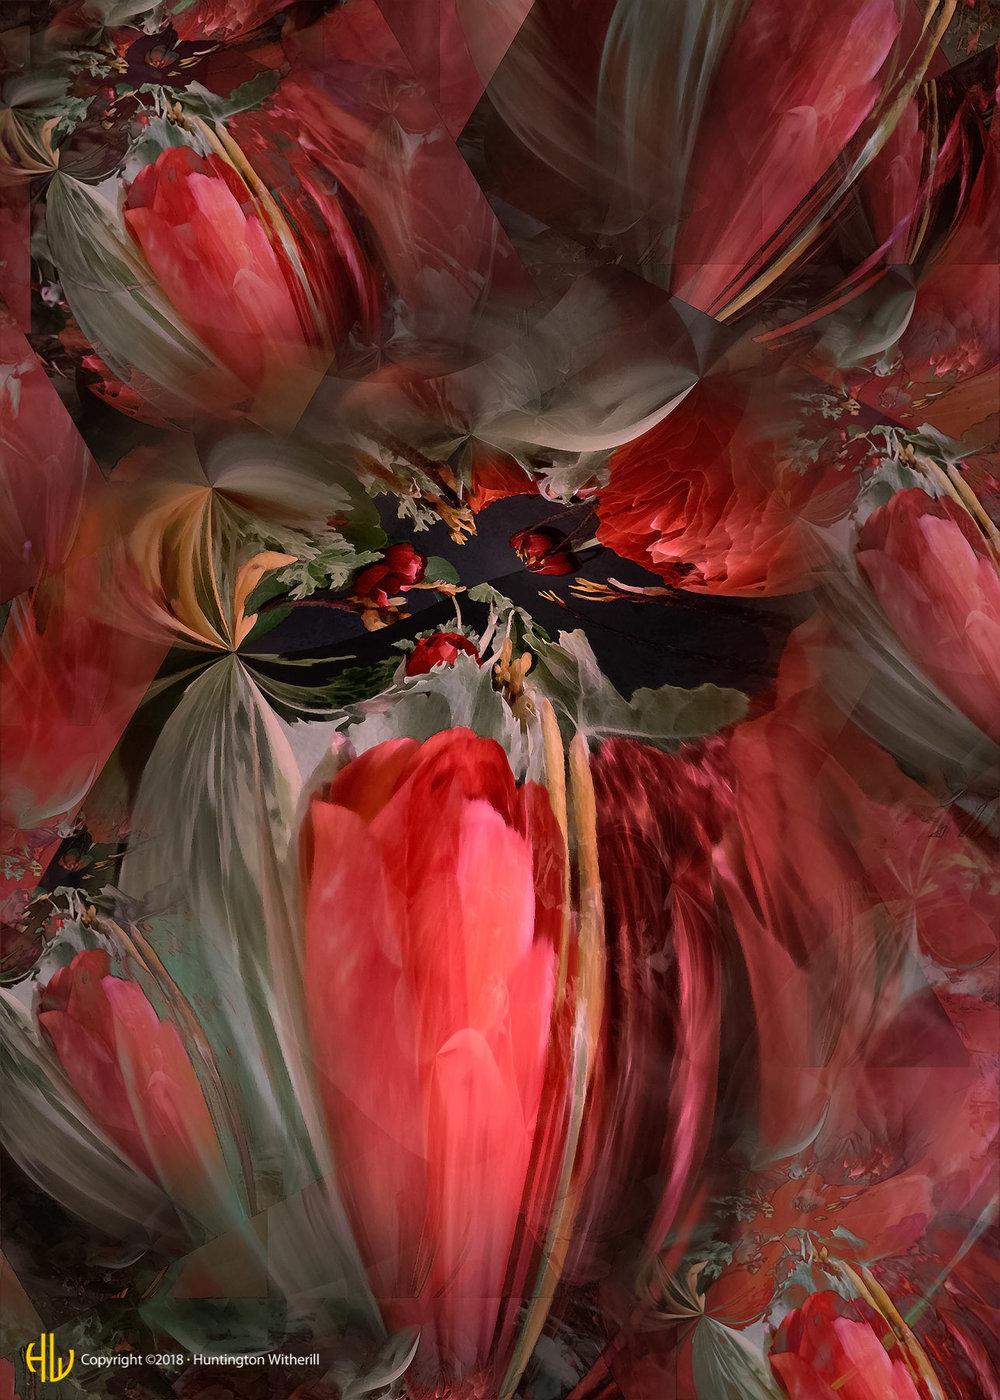 Tulips #34, 2003